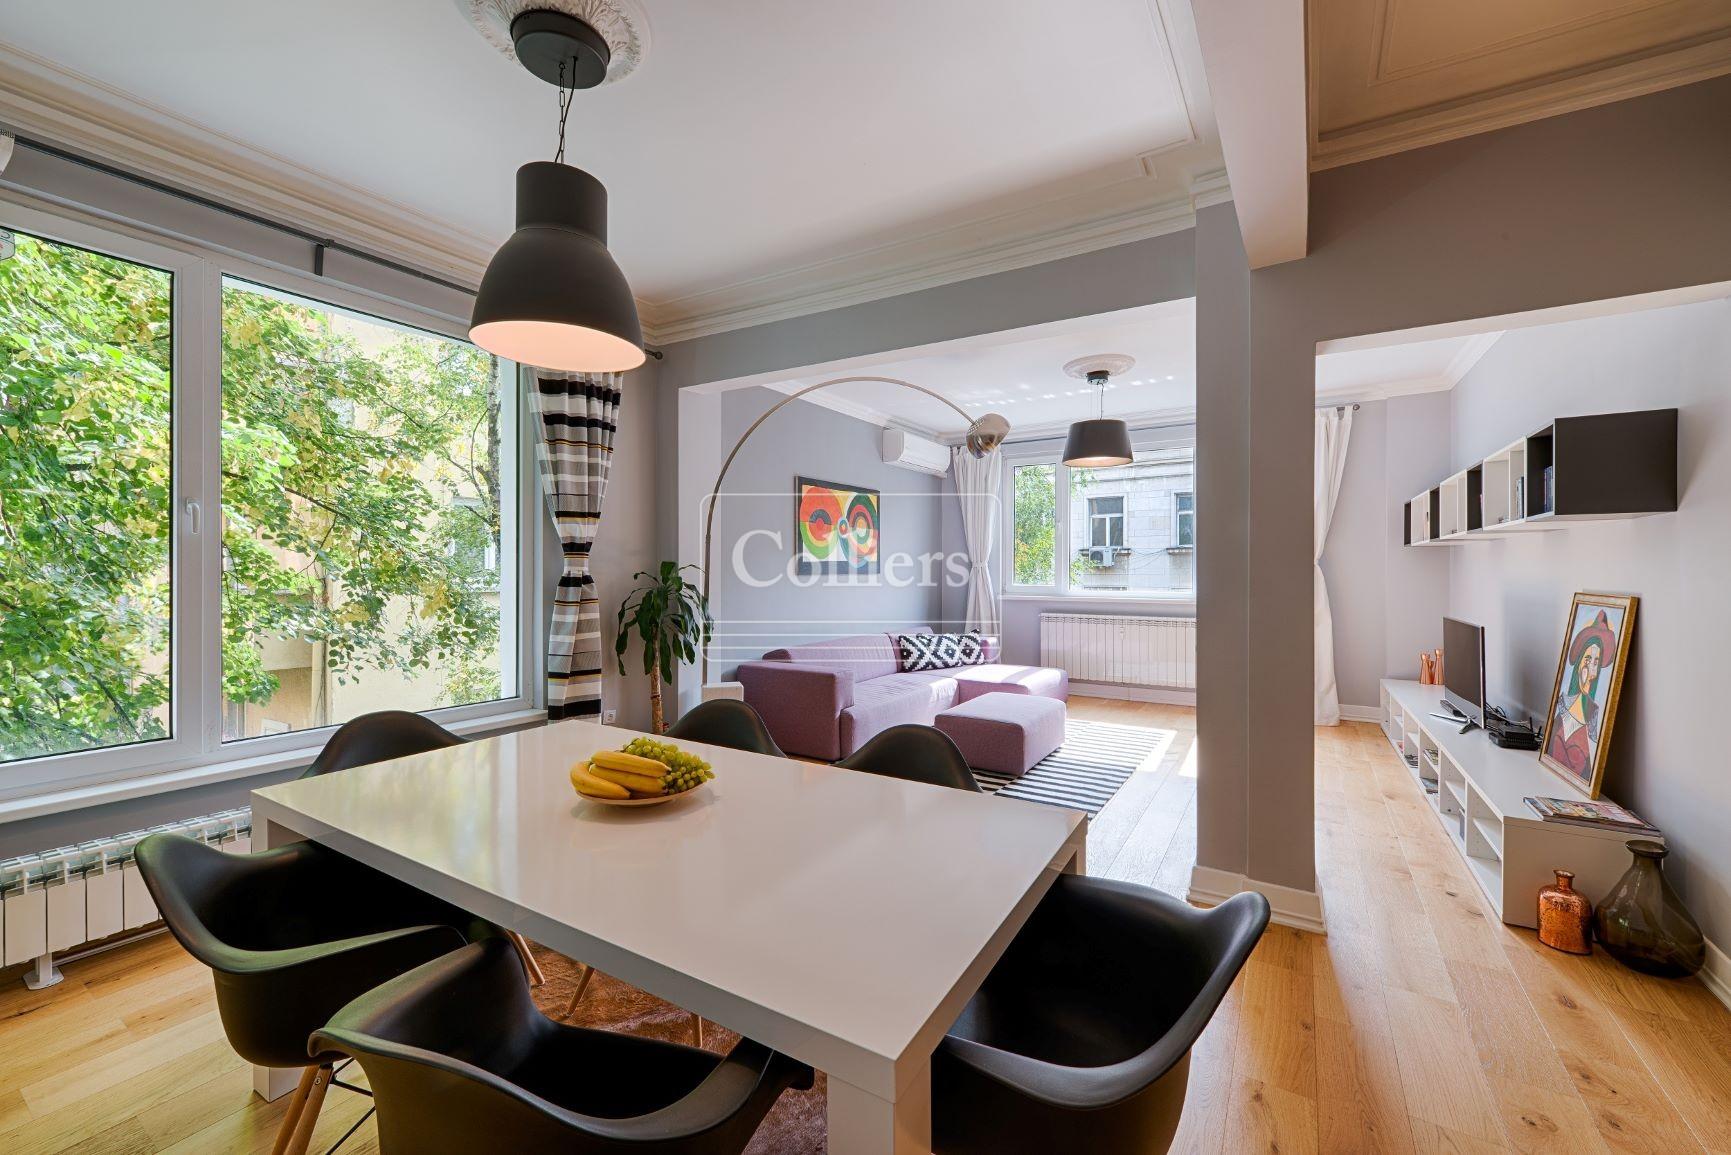 Bright 2-bedroom apartment at superb location